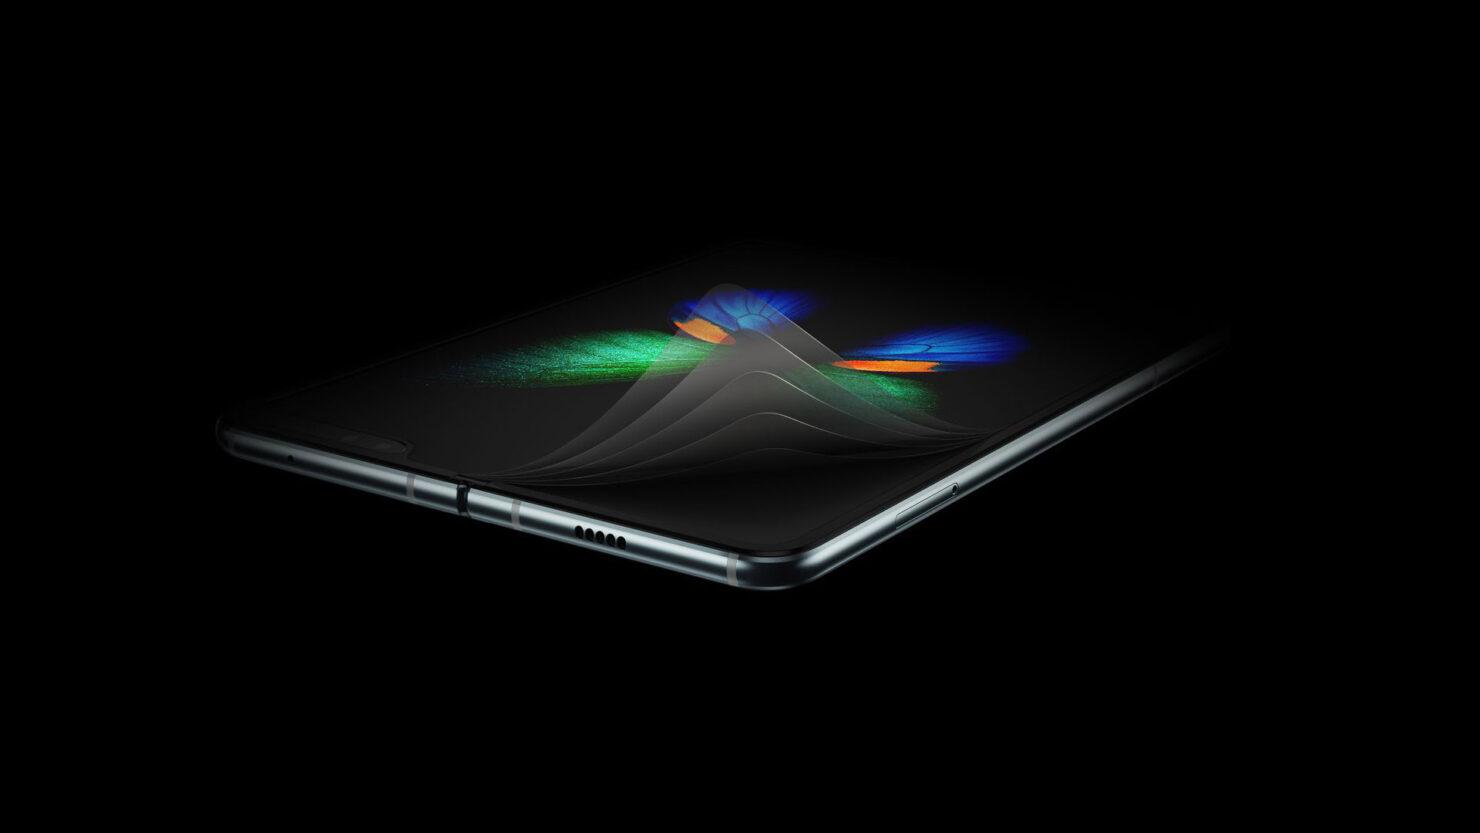 Proper Galaxy Fold Successor in the Works, Suggests New Codename Leak